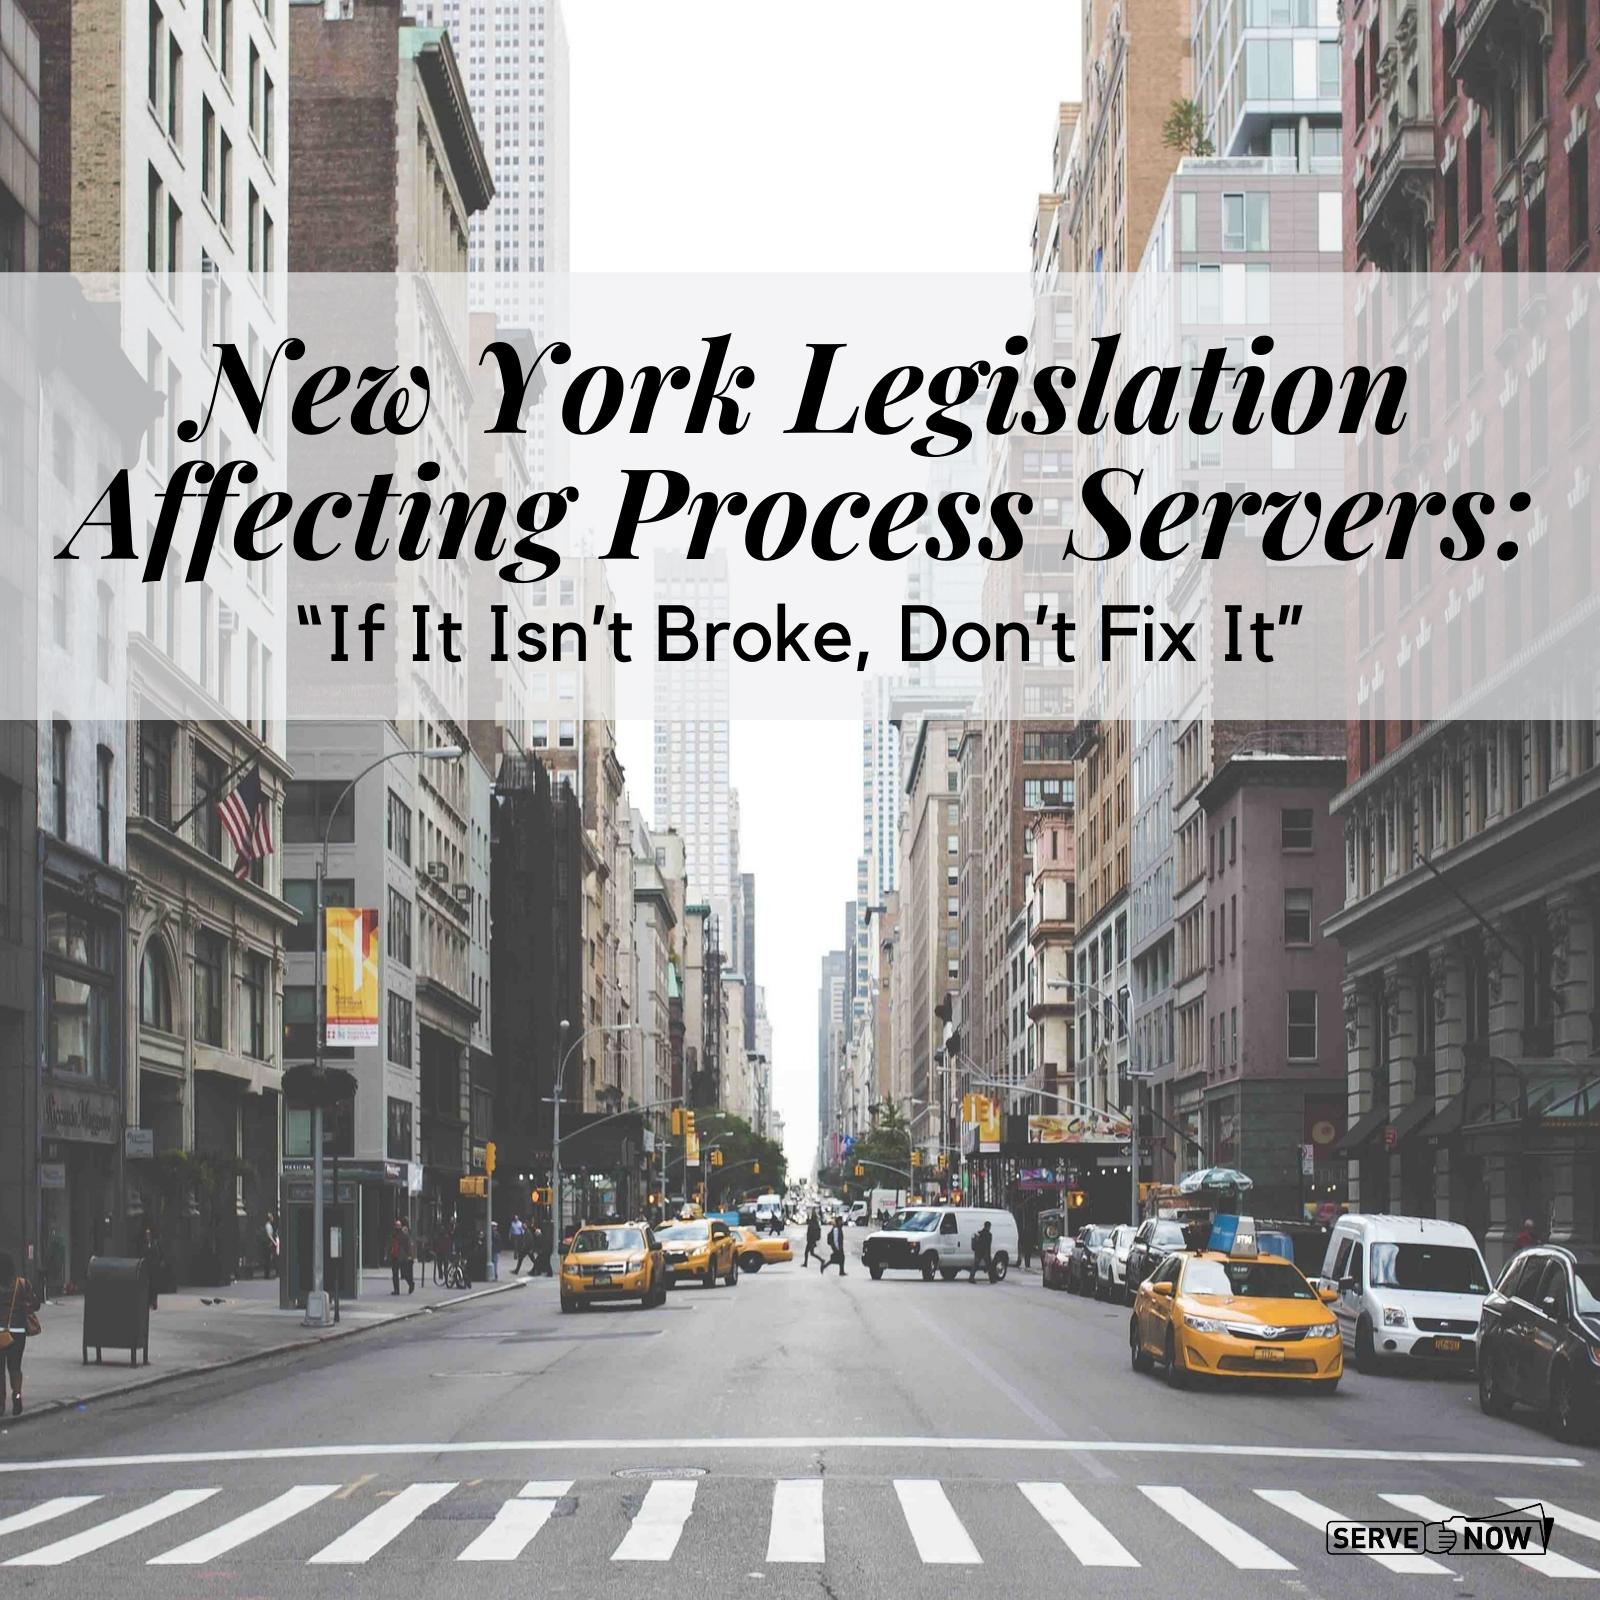 New York Legislation Affecting Process Servers